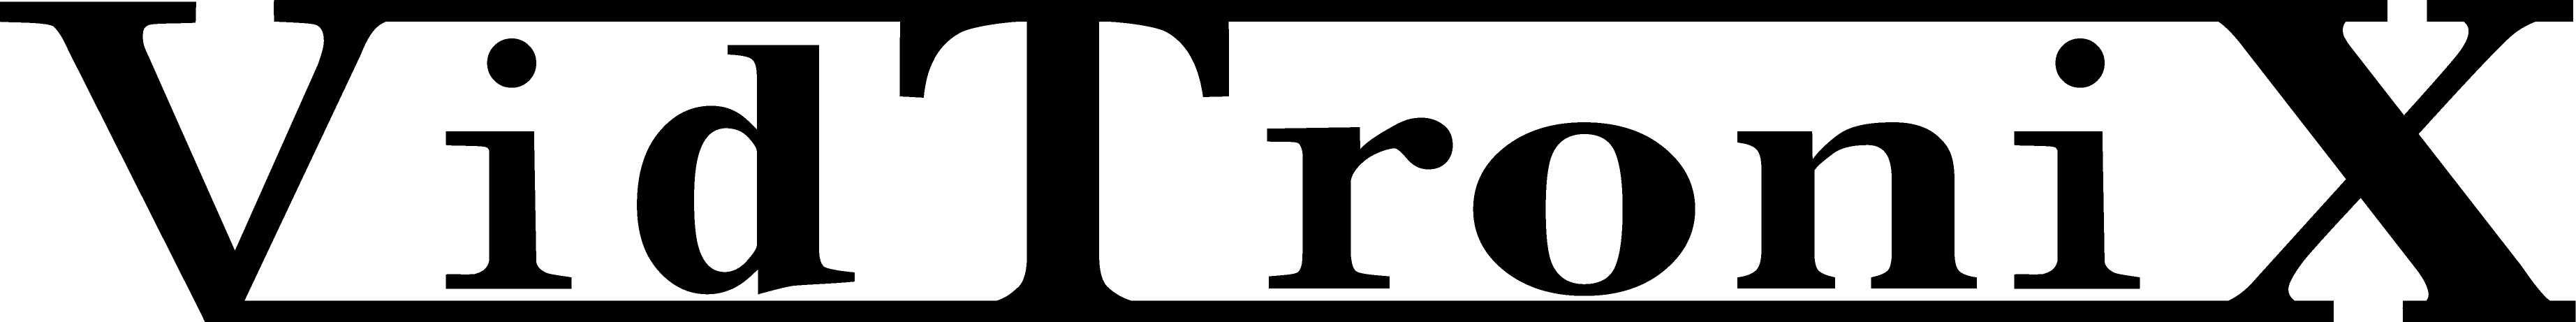 VidTronix Logo - Copy